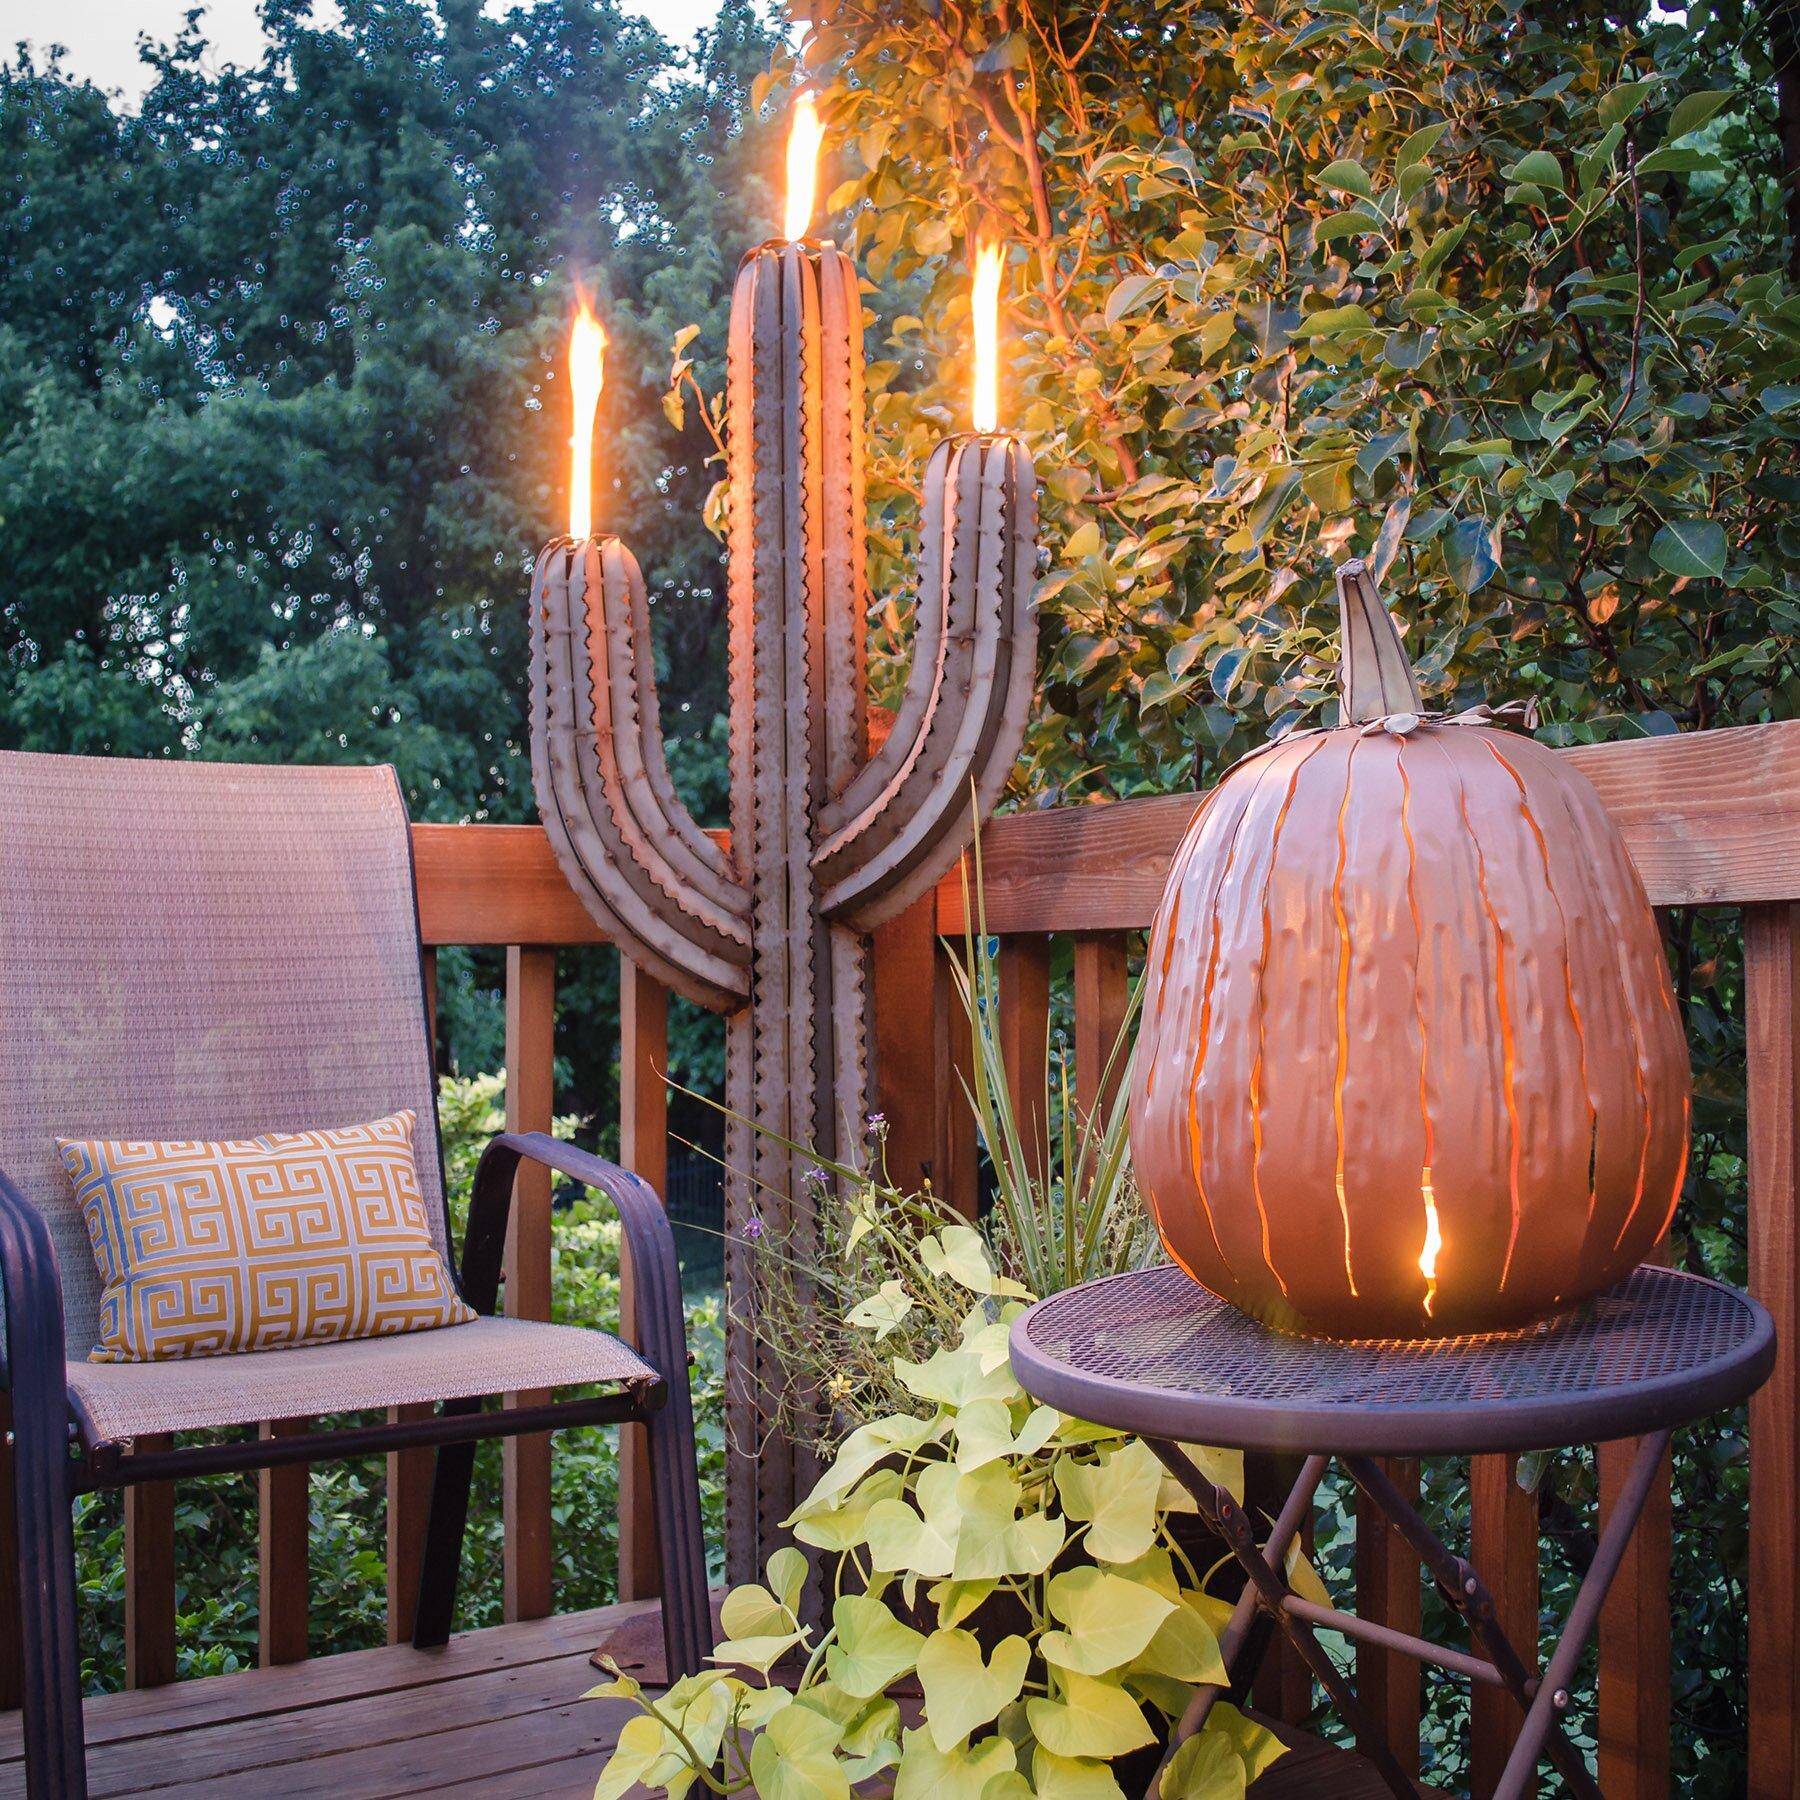 desert steel great pumpkin lantern decoration reviews. Black Bedroom Furniture Sets. Home Design Ideas